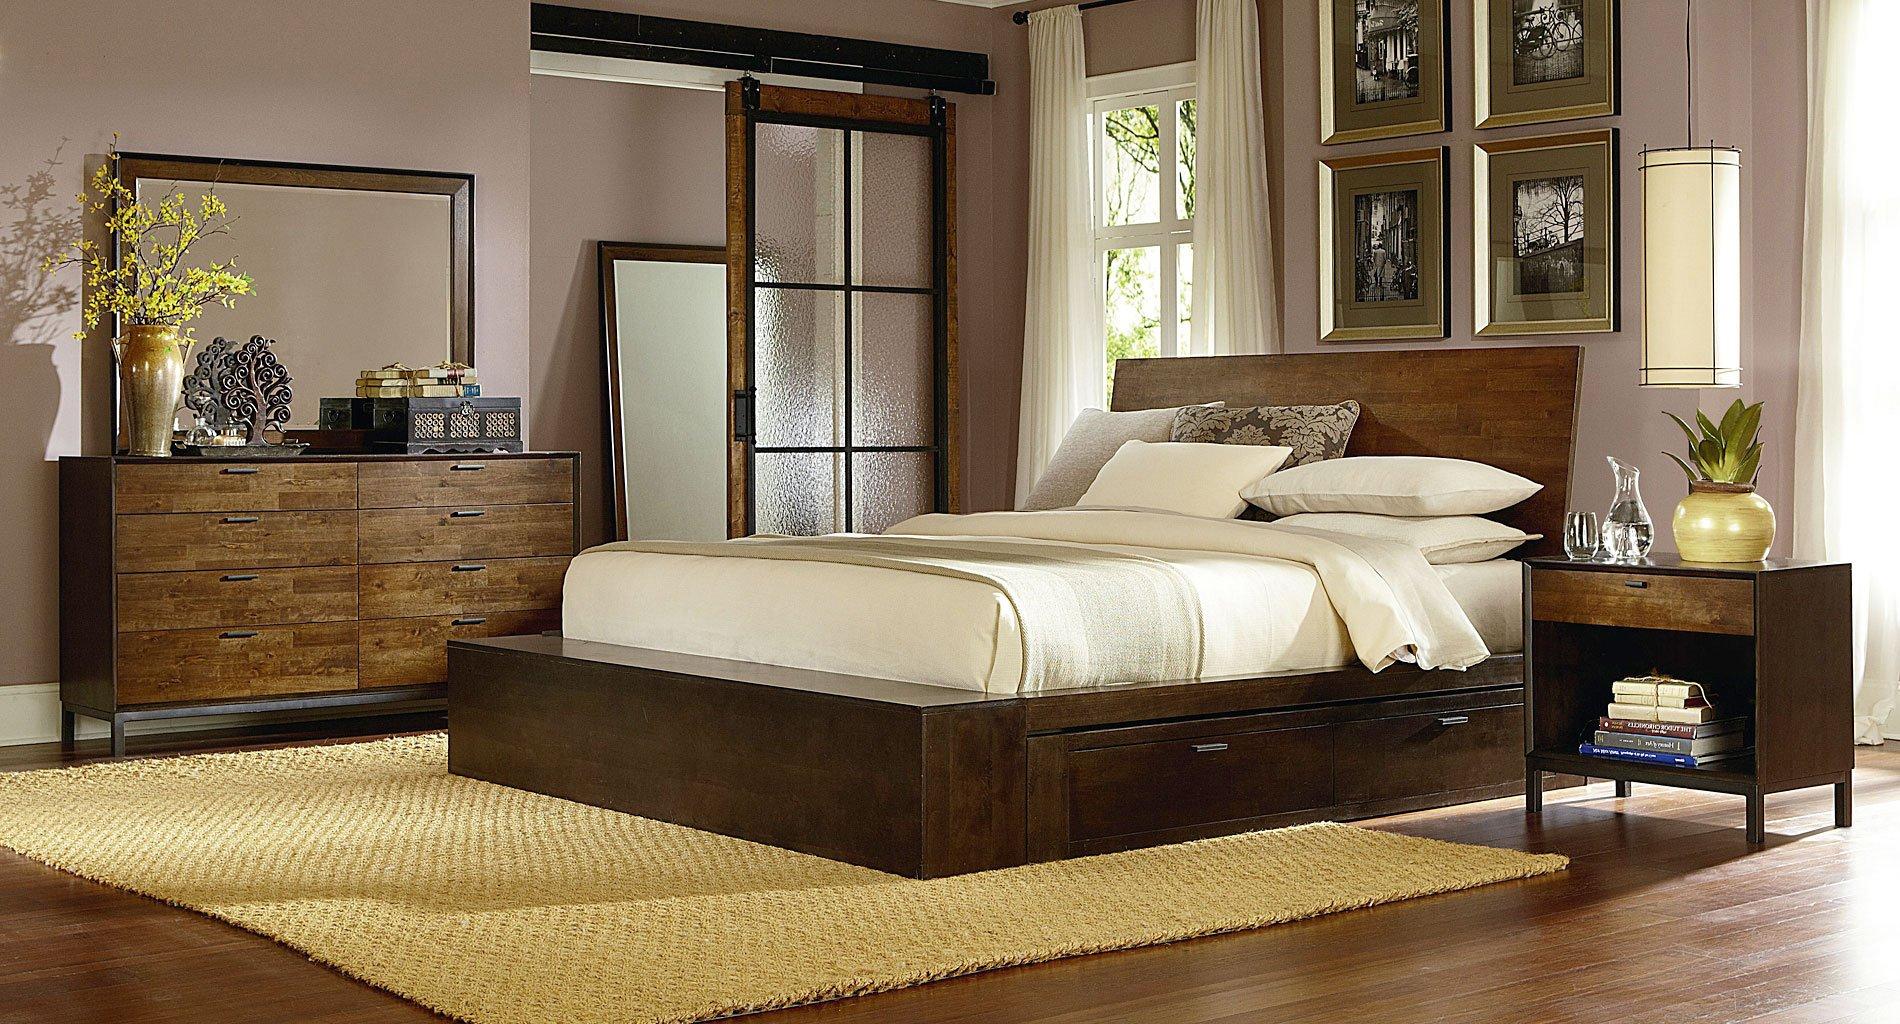 Kateri Platform Bedroom Set W/ One Underbed Storage Unit ...